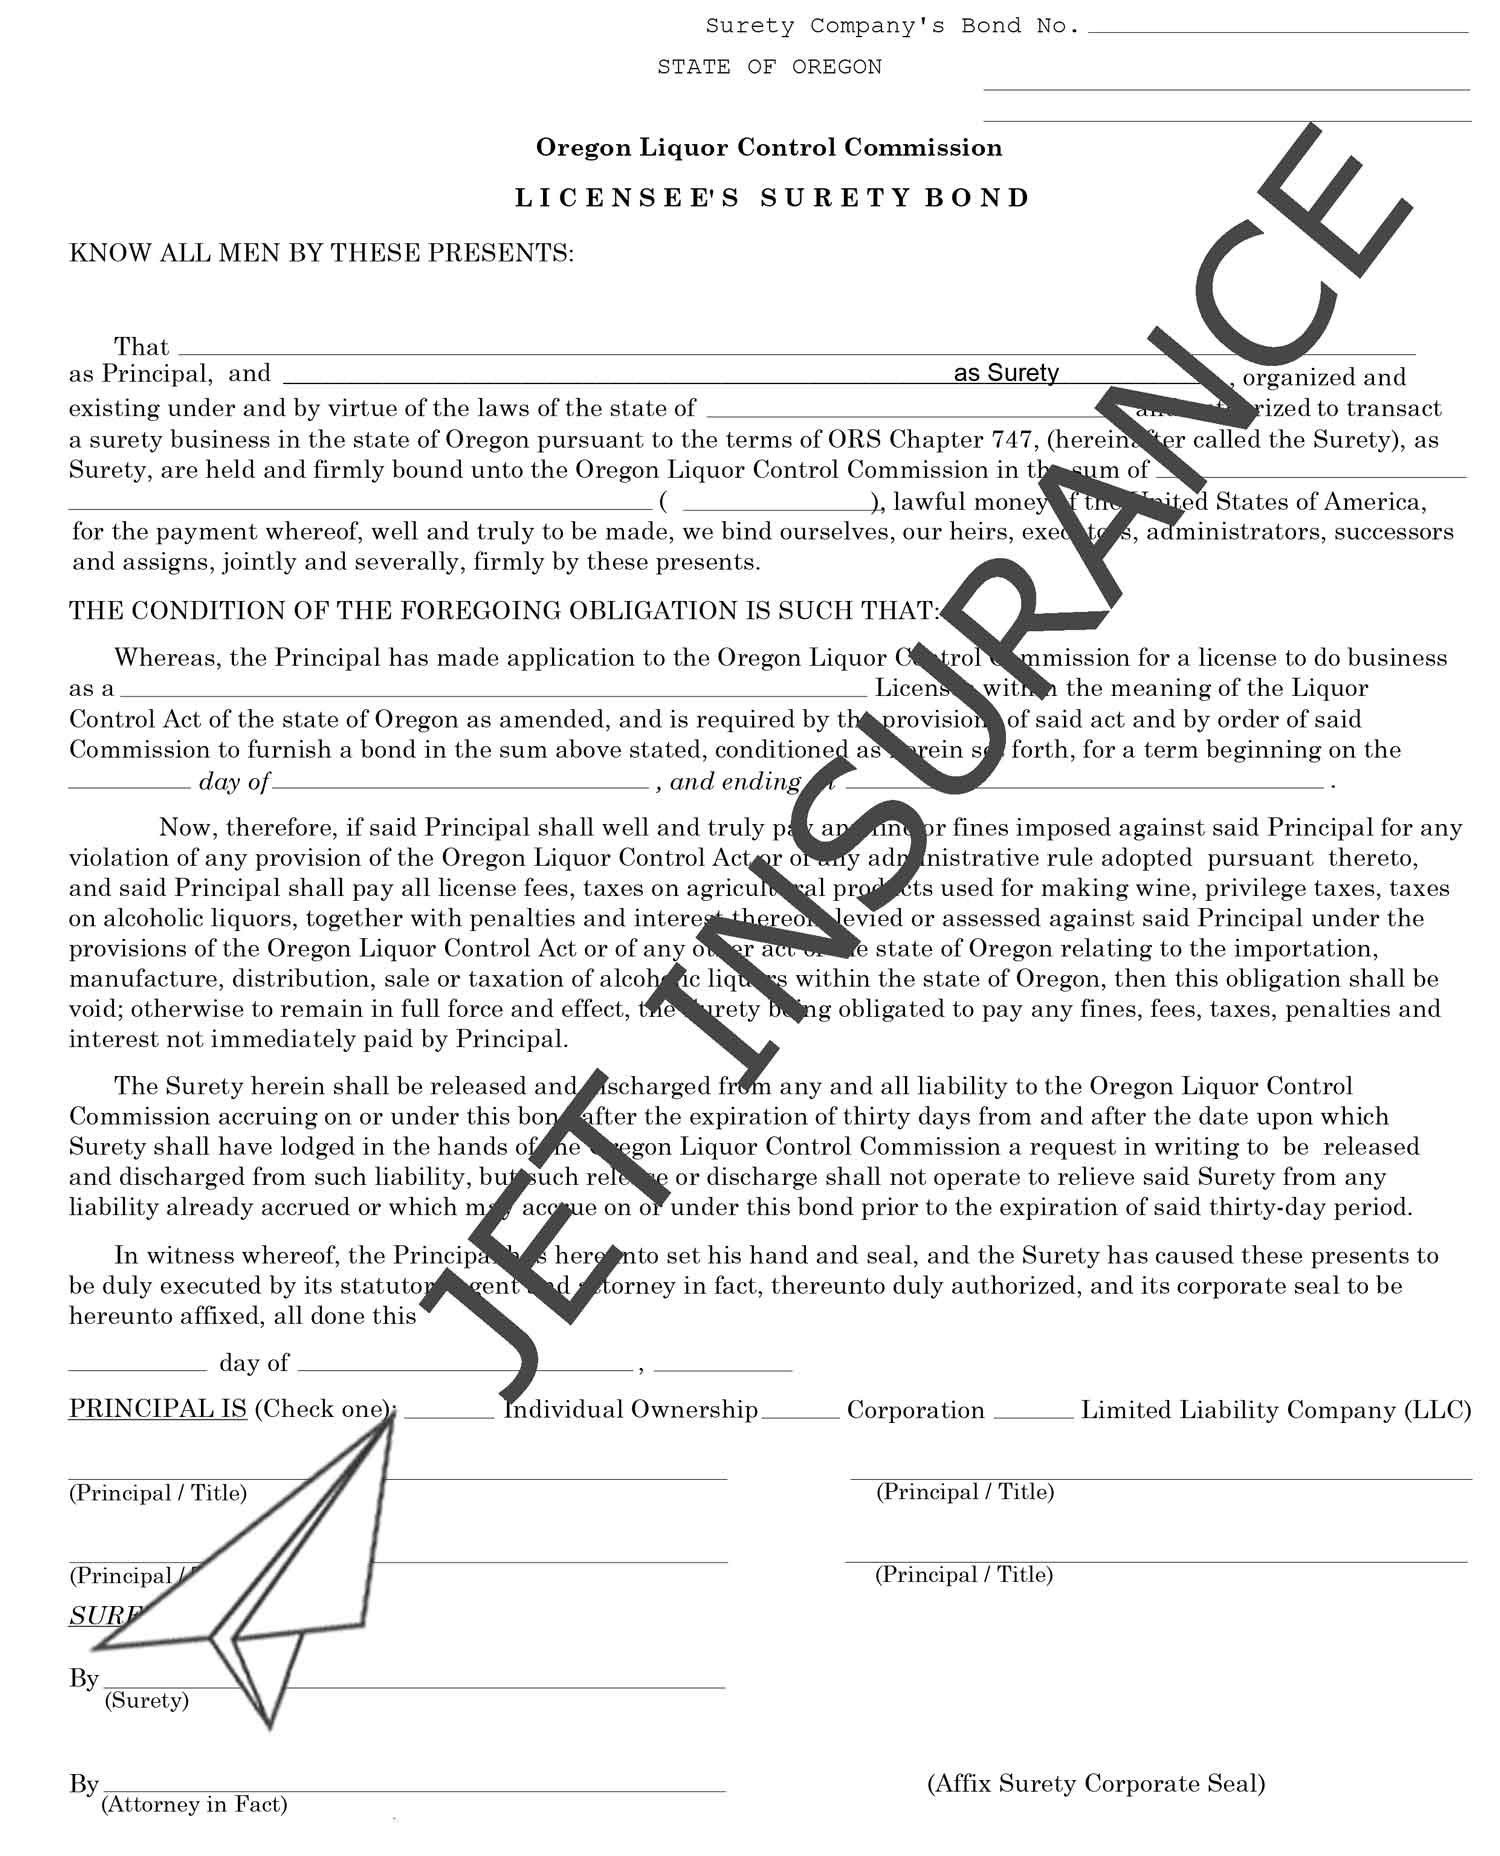 Oregon Liquor Control Commission Bond Form